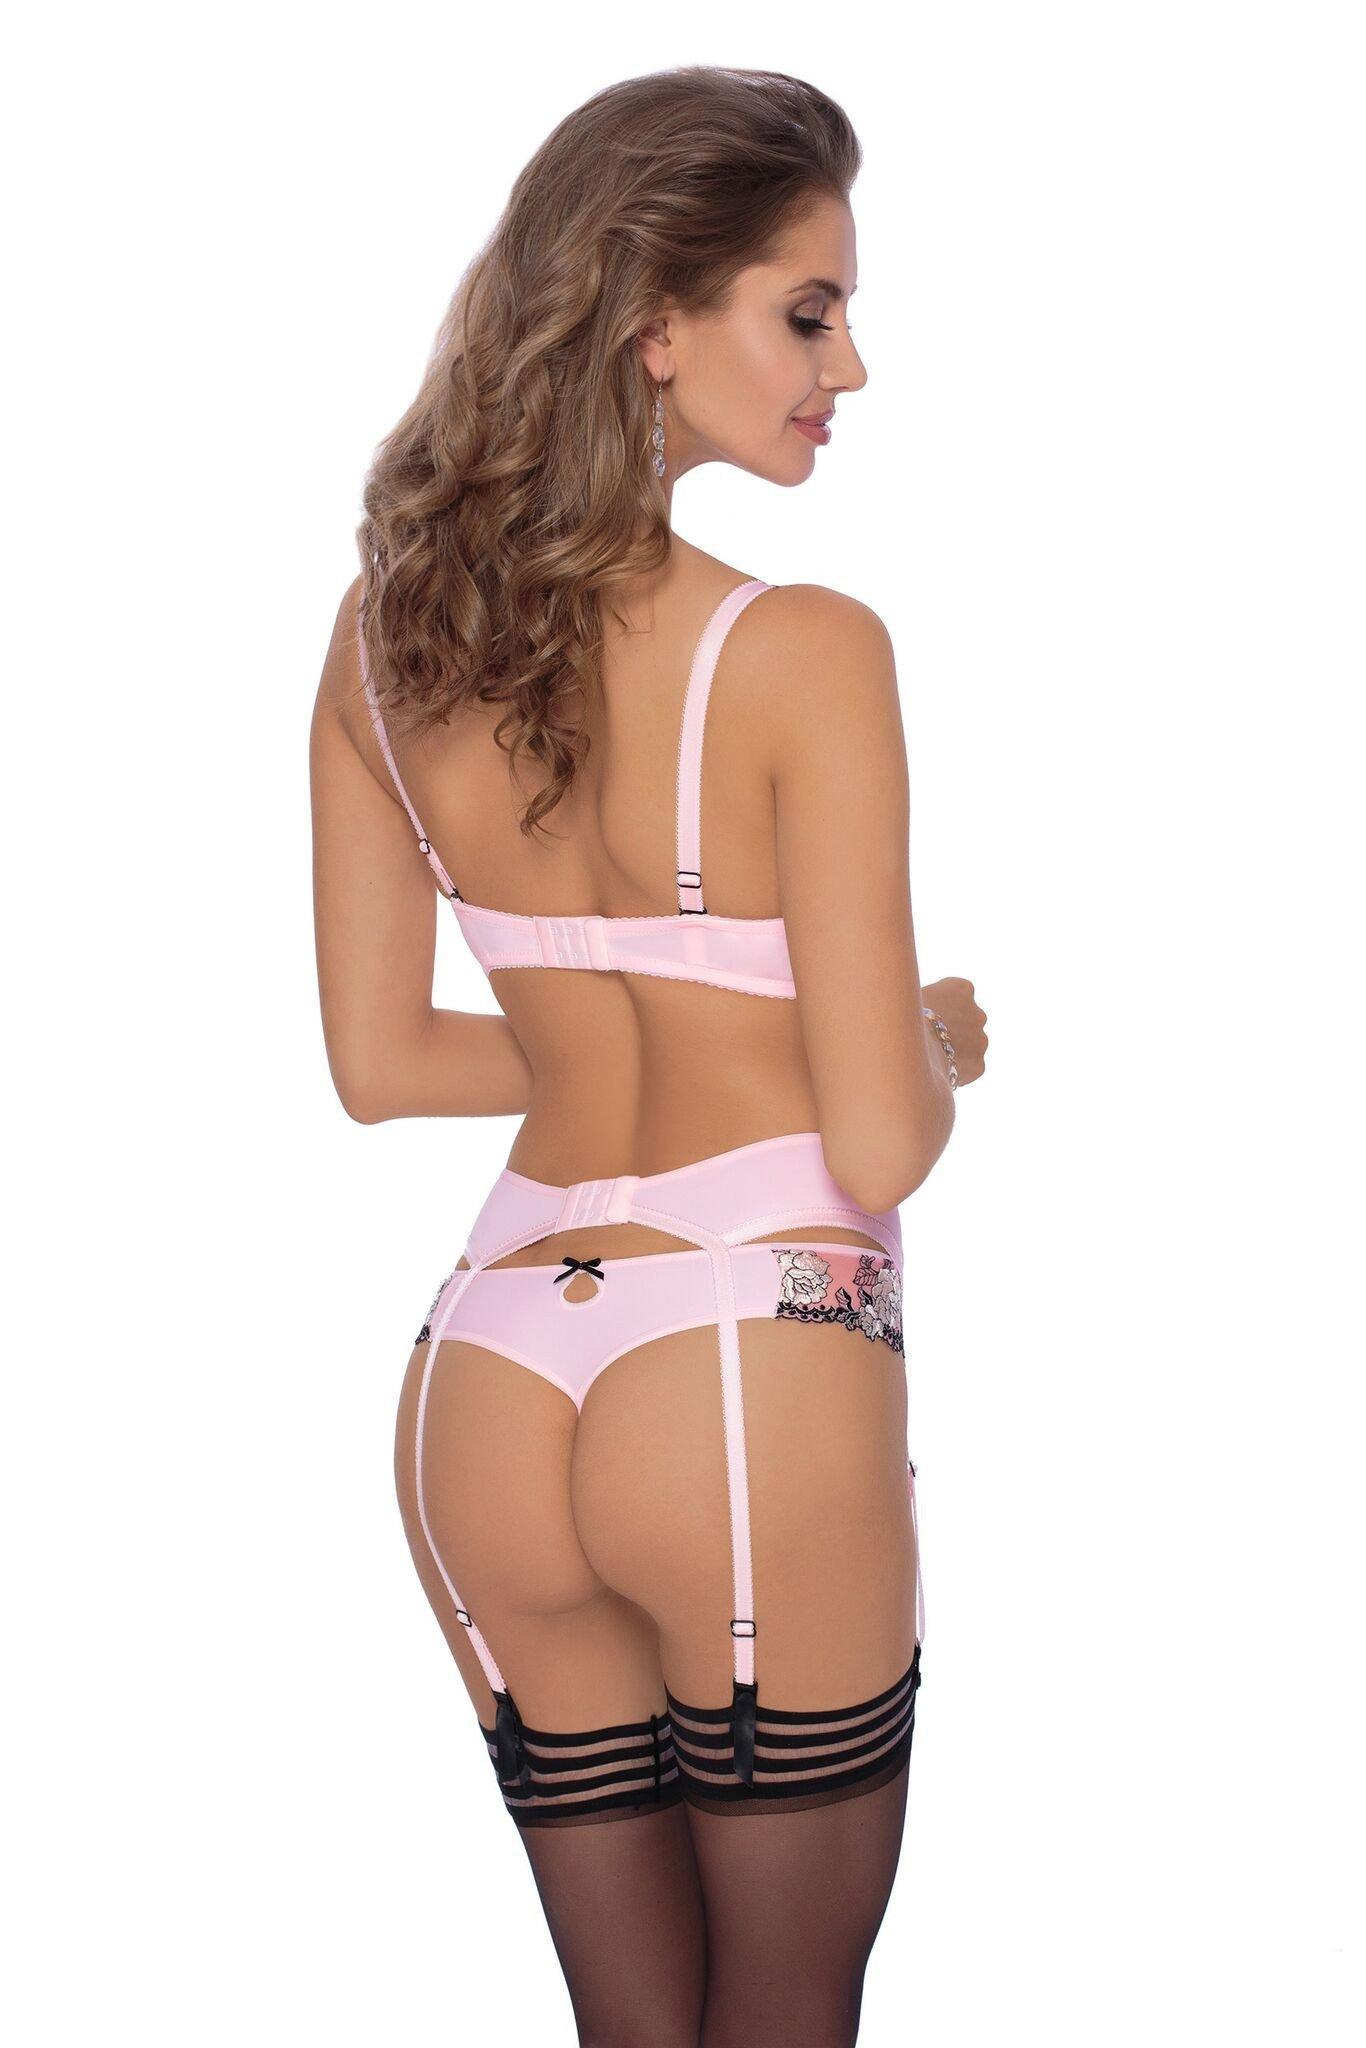 roza natali suspender belt (pink) - suspender belts - roza - charm and zzbhtpj